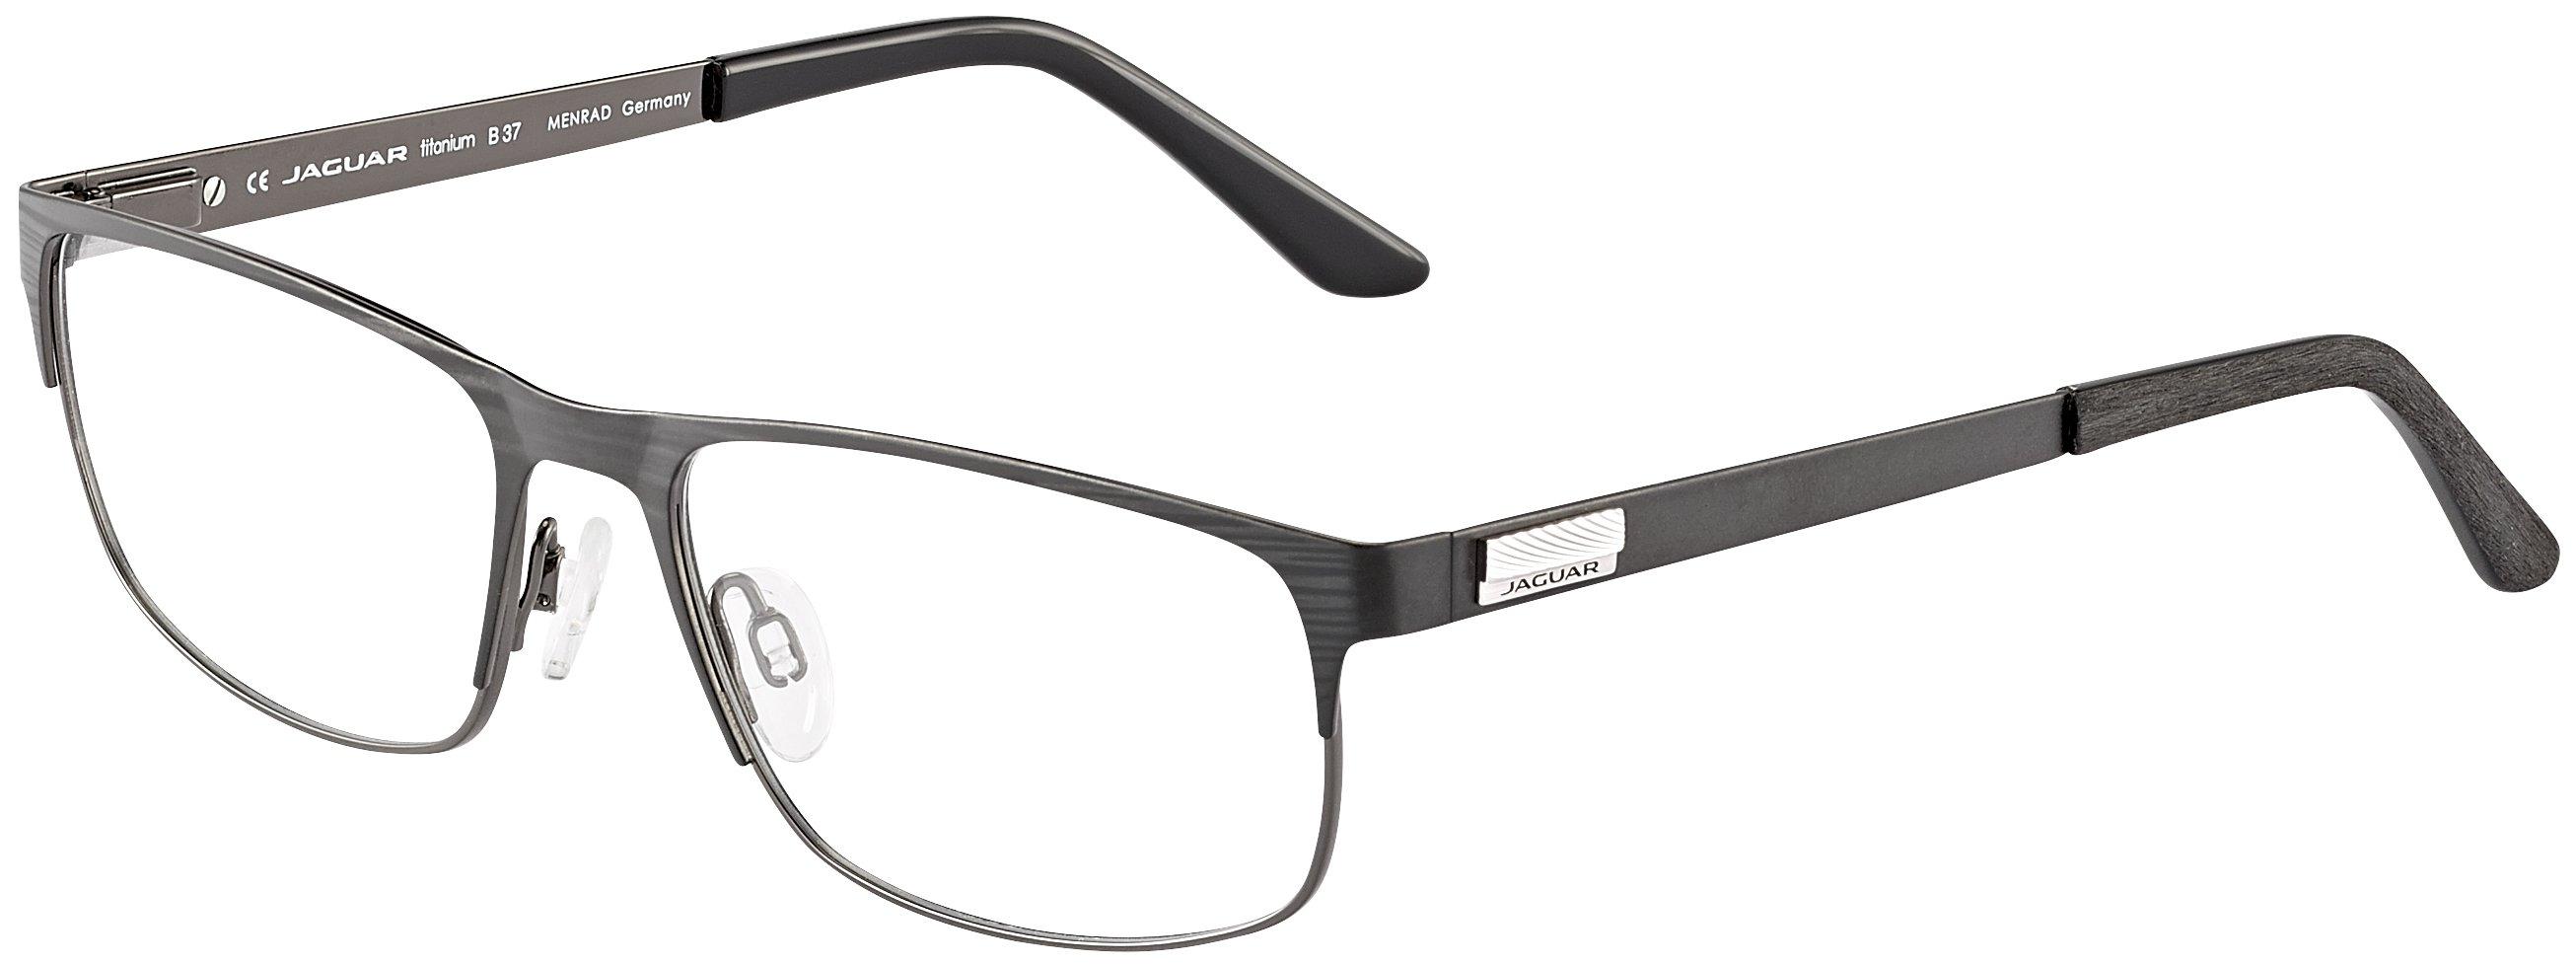 4841d2d237 Jaguar 35045 Eyeglass Frames . Jaguar Eyeglasses.